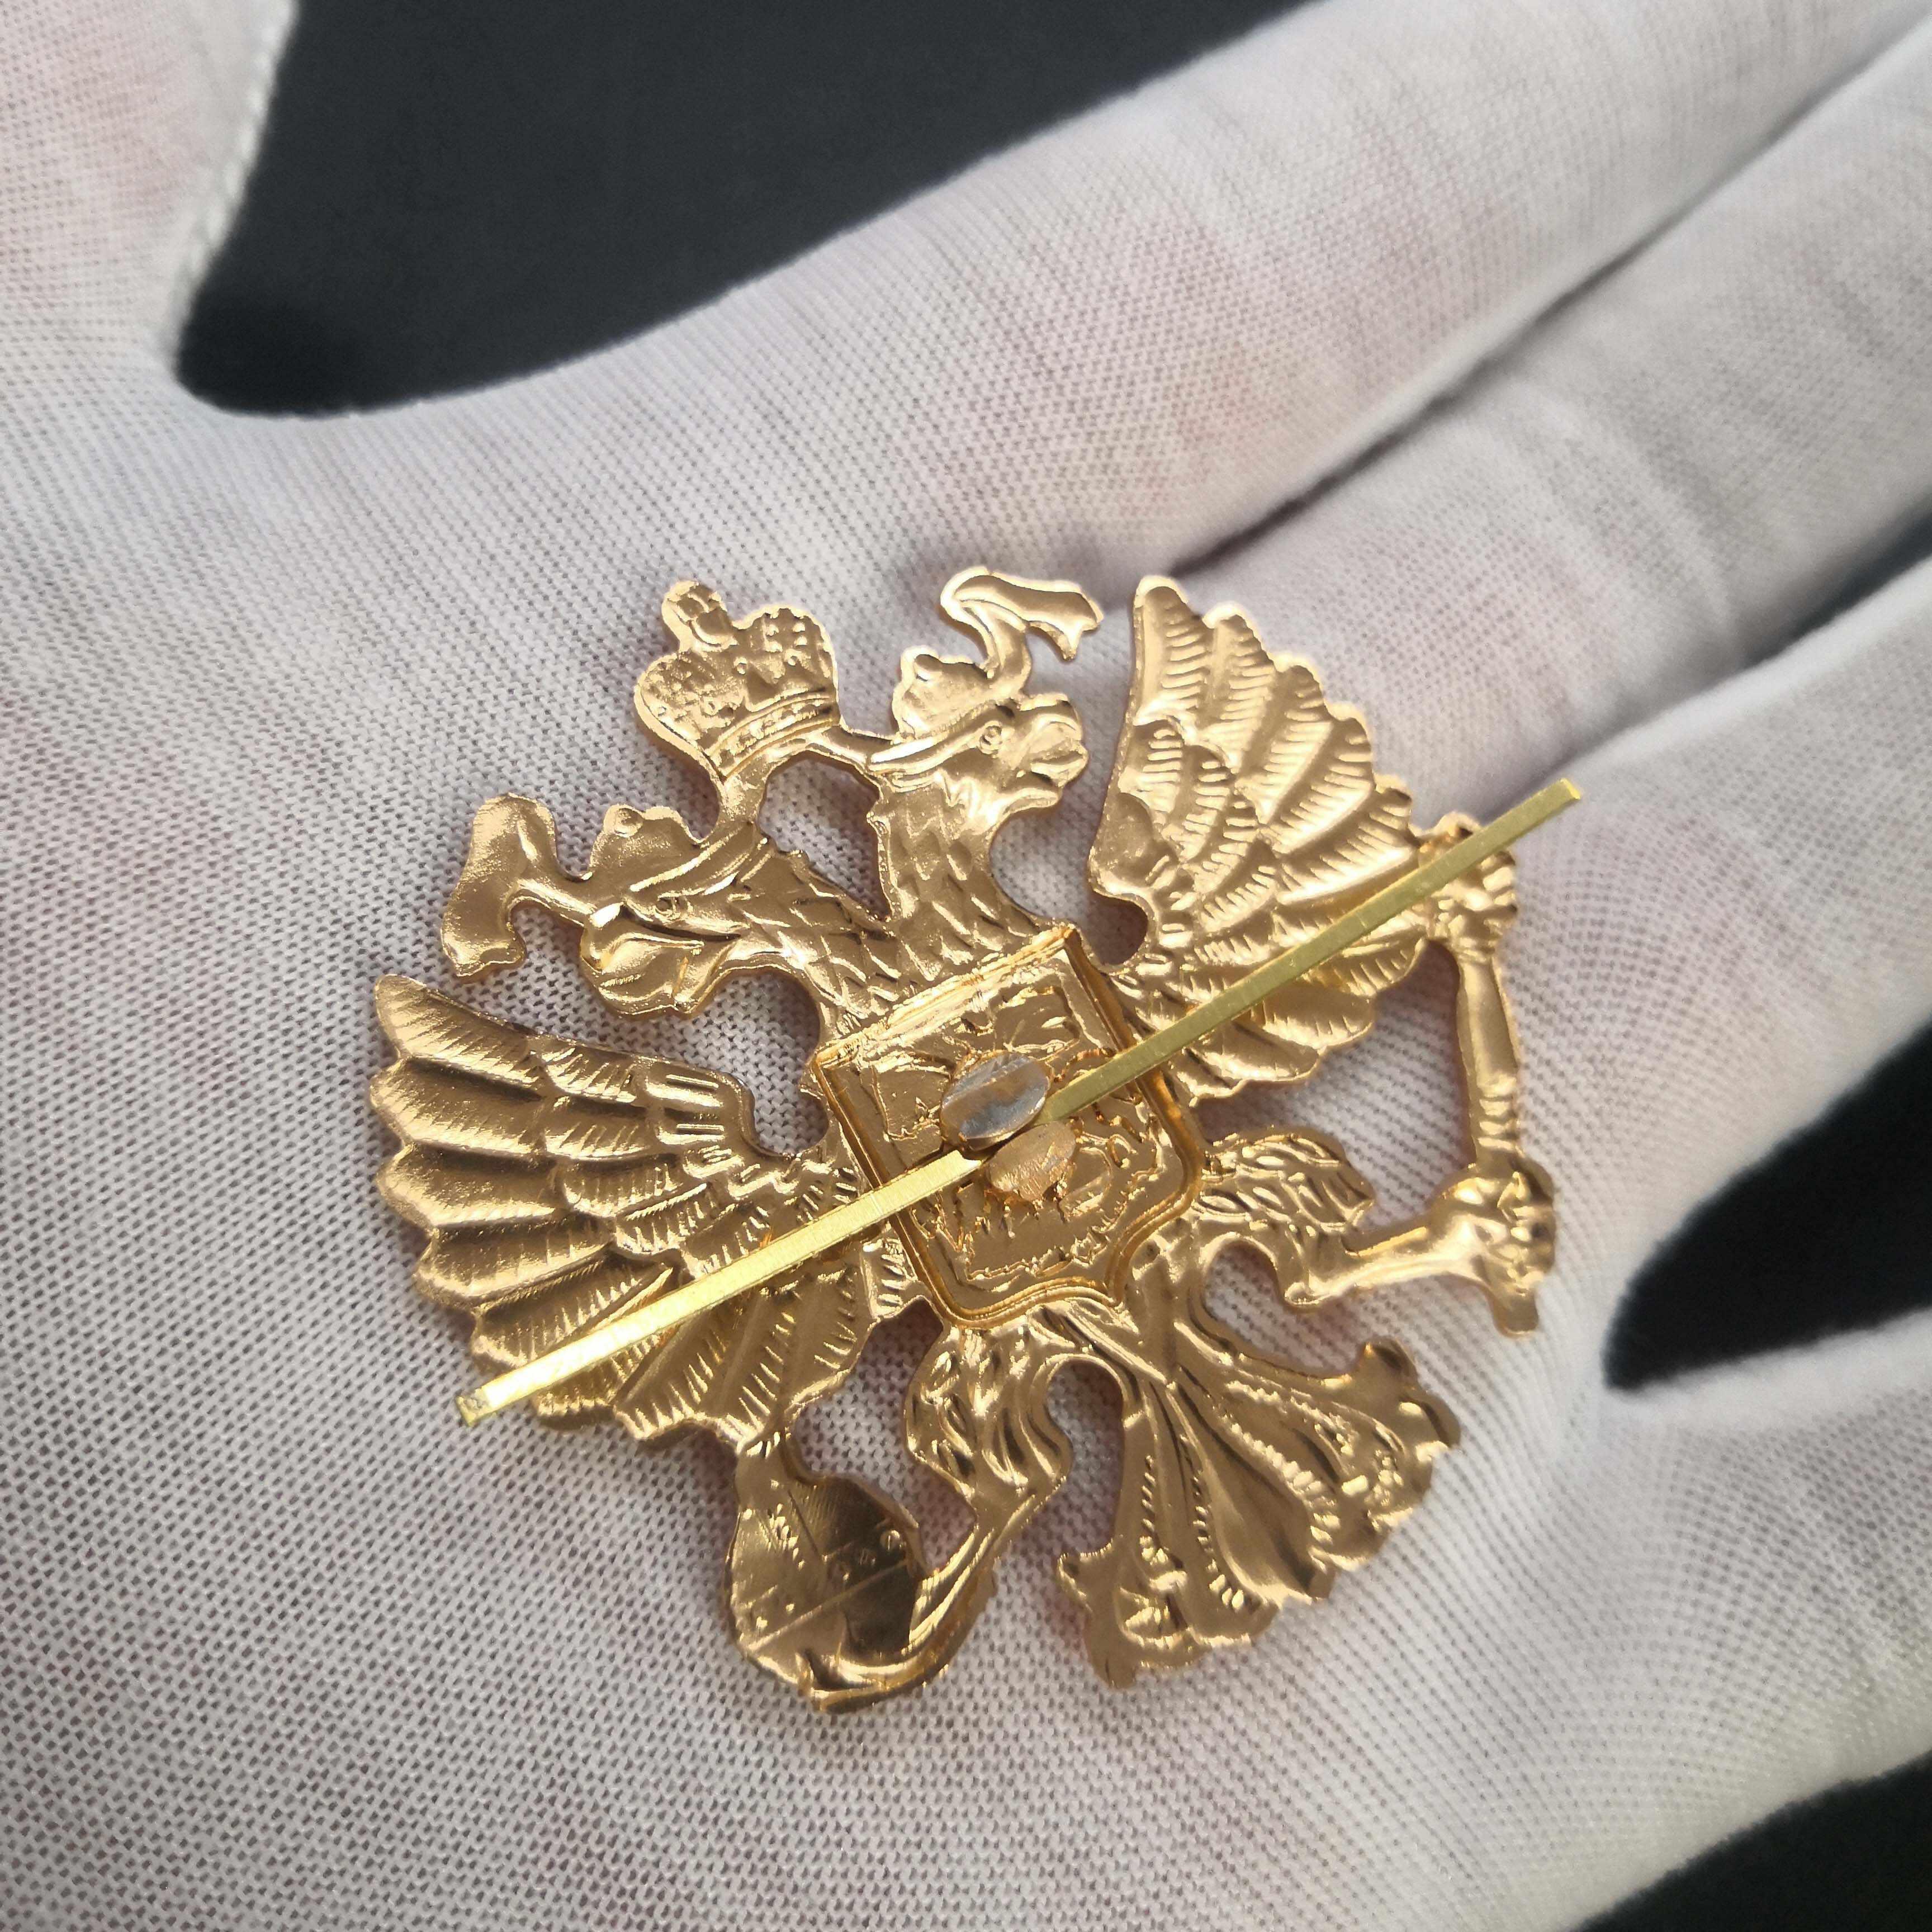 Pro Kitty Medali Rusia Double-Headed Eagle Medali Lambang Nasional Cockatiel Topi Pin Lencana